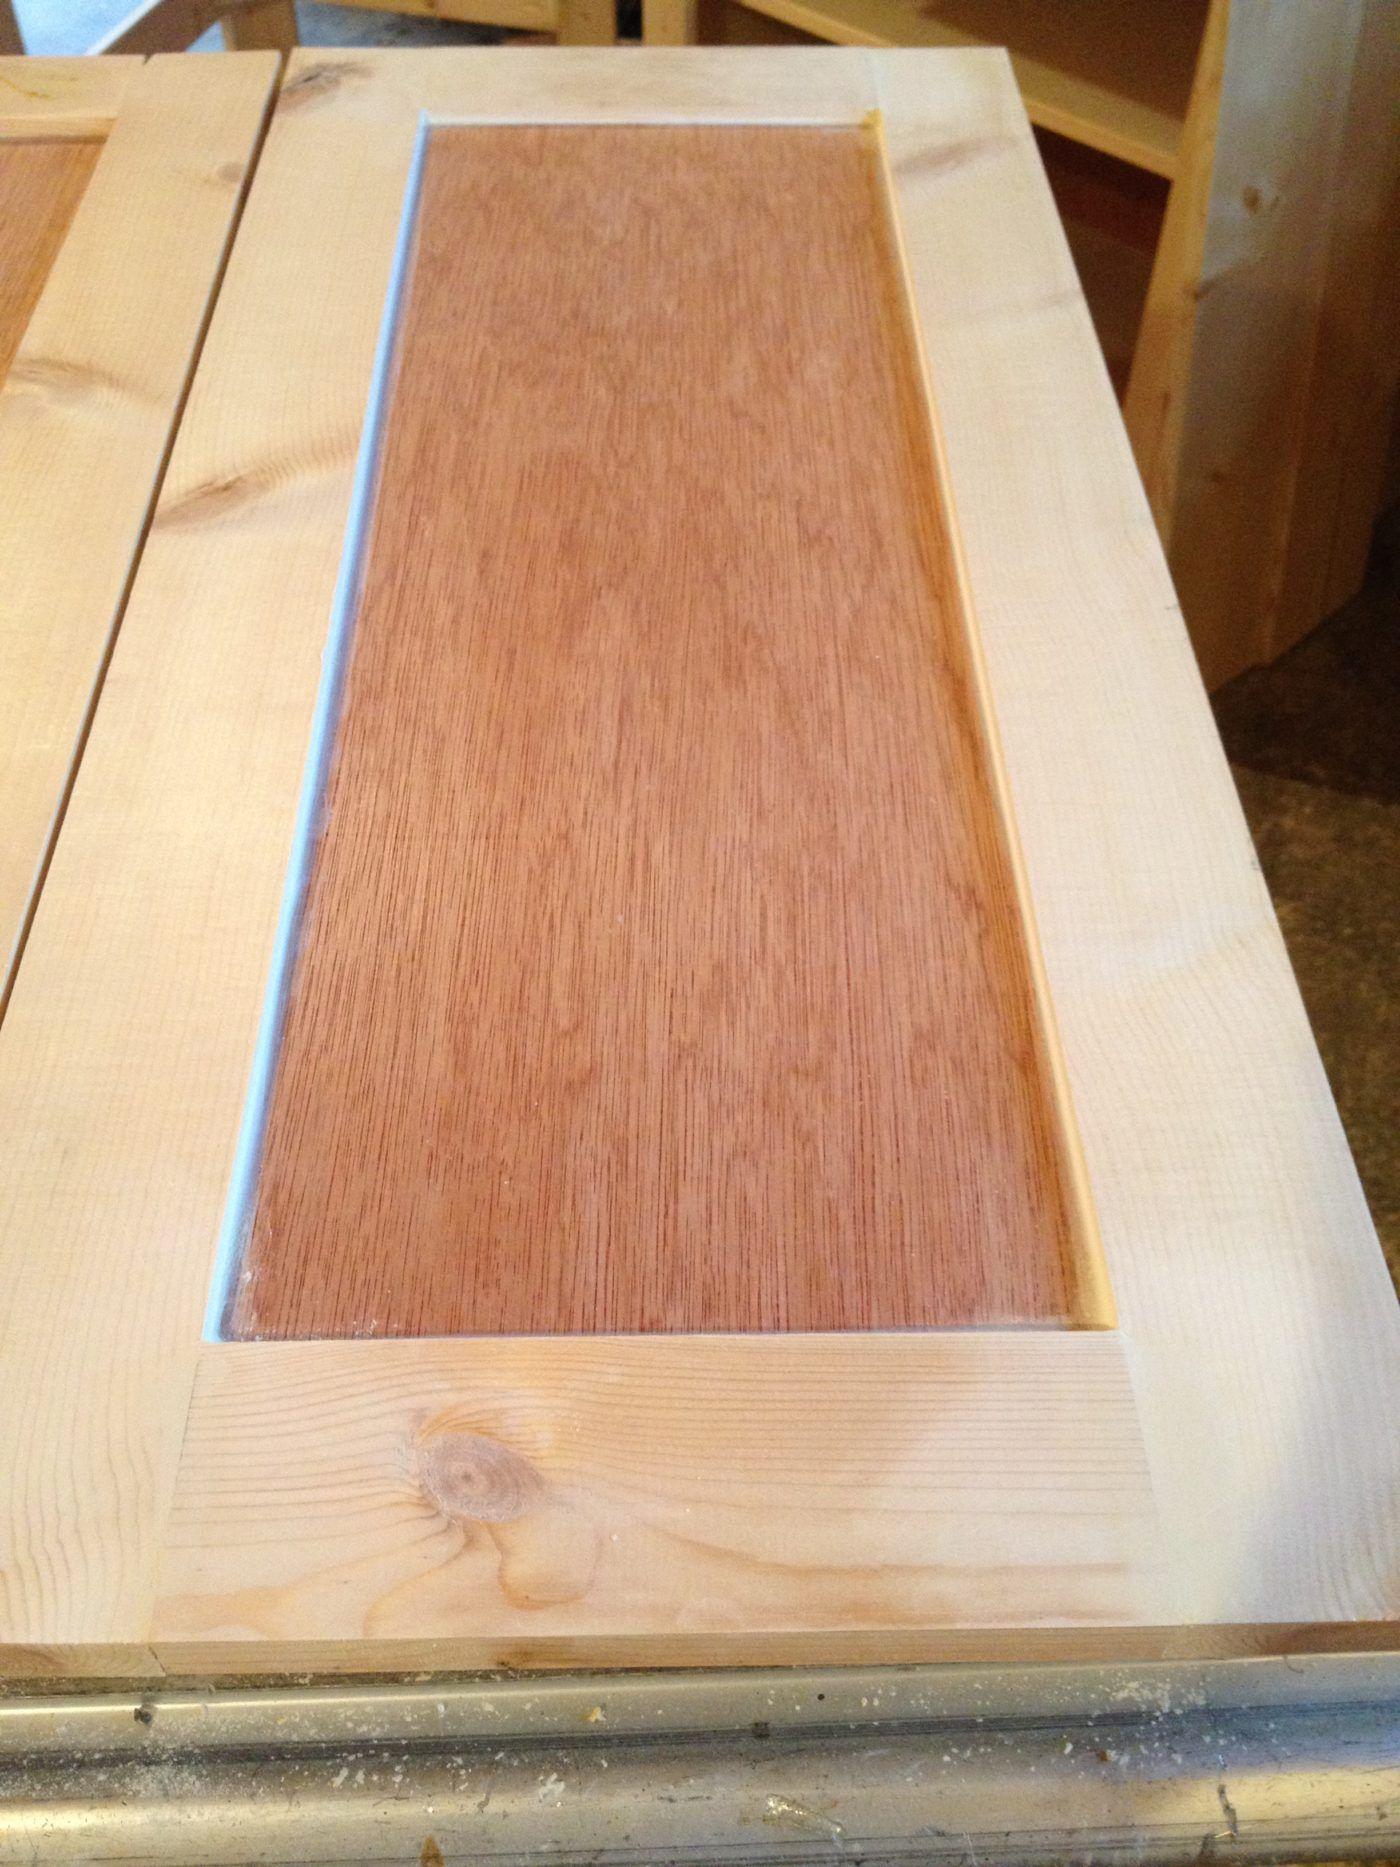 The Making of Shaker Cabinet Doors | Pinterest | Diy holz, Holz und ...